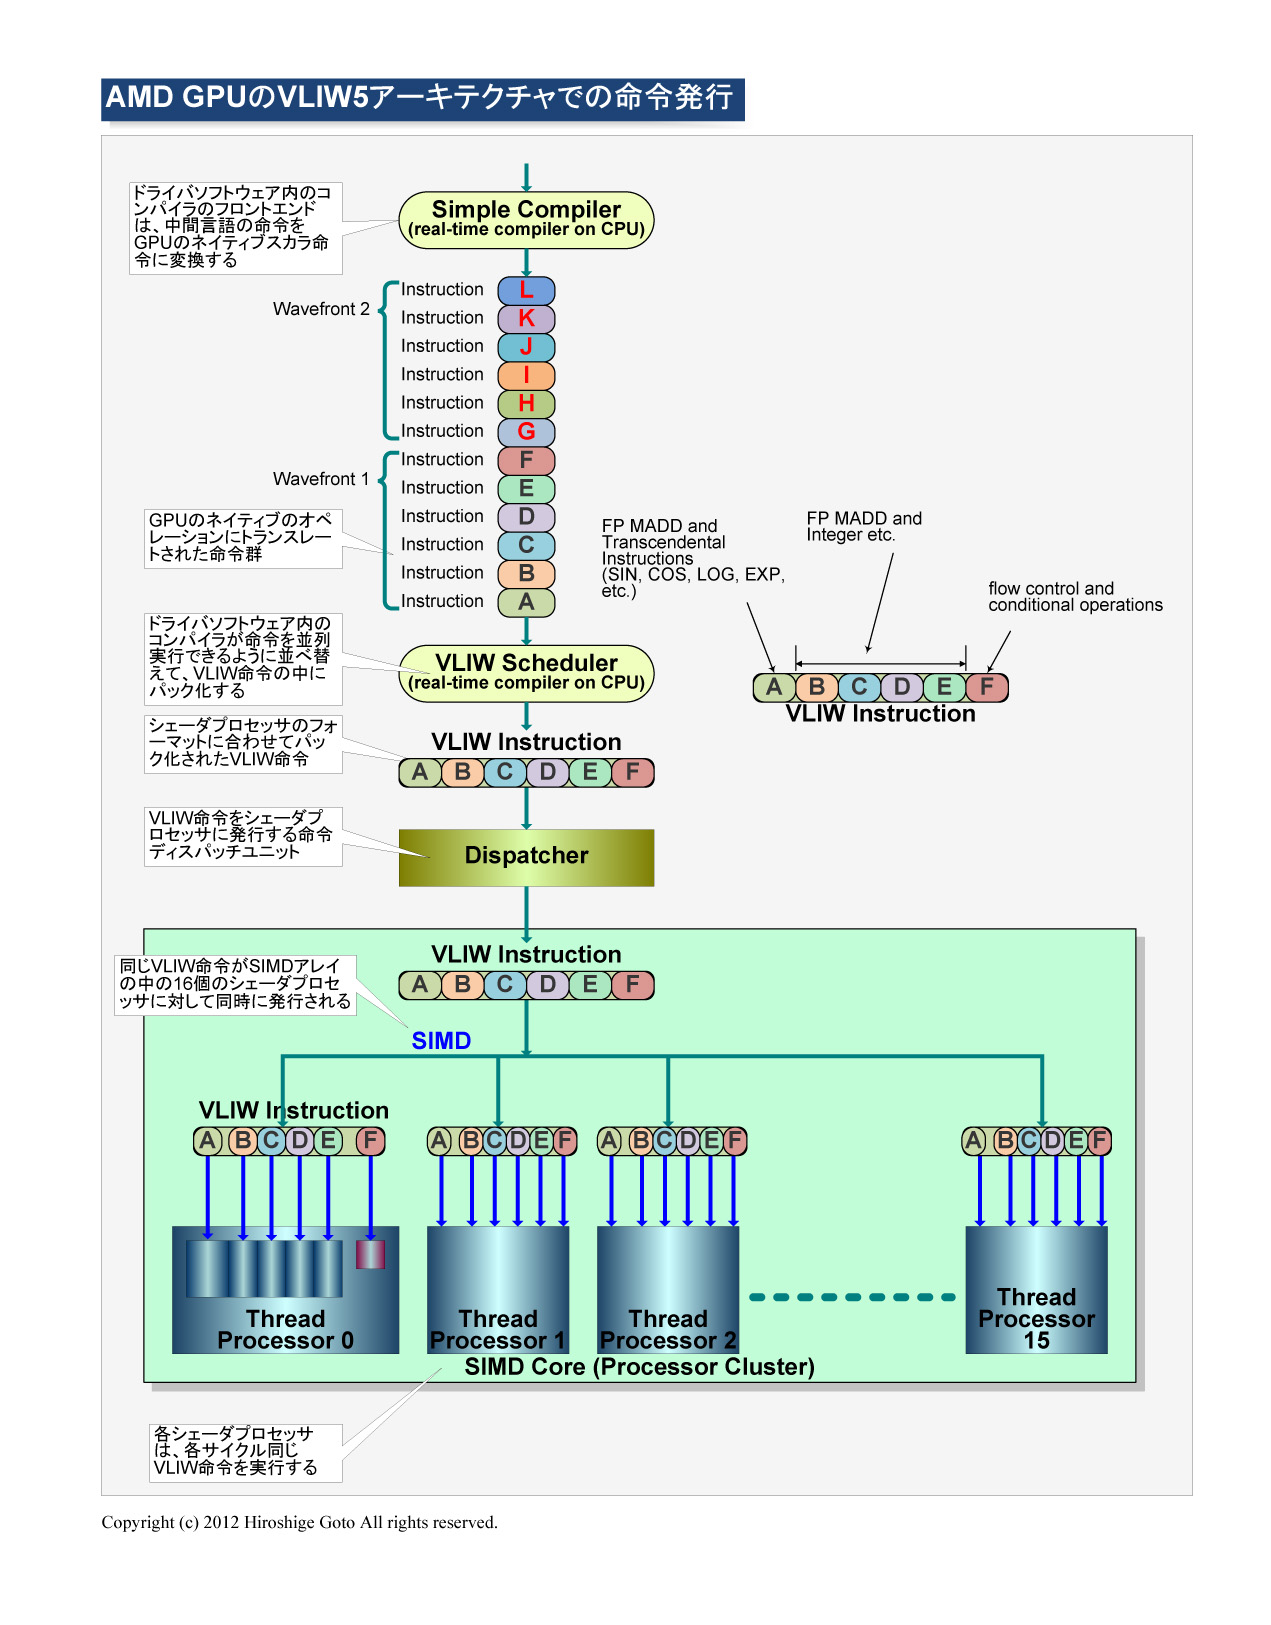 "AMDのVLIW5アーキテクチャでの命令発行<br class="""">PDF版は<span class=""img-inline raw""><a href=""/video/pcw/docs/591/173/p2.pdf"" ipw_status=""1"" ipw_linktype=""filelink_raw"" class=""resource"">こちら</a></span>"